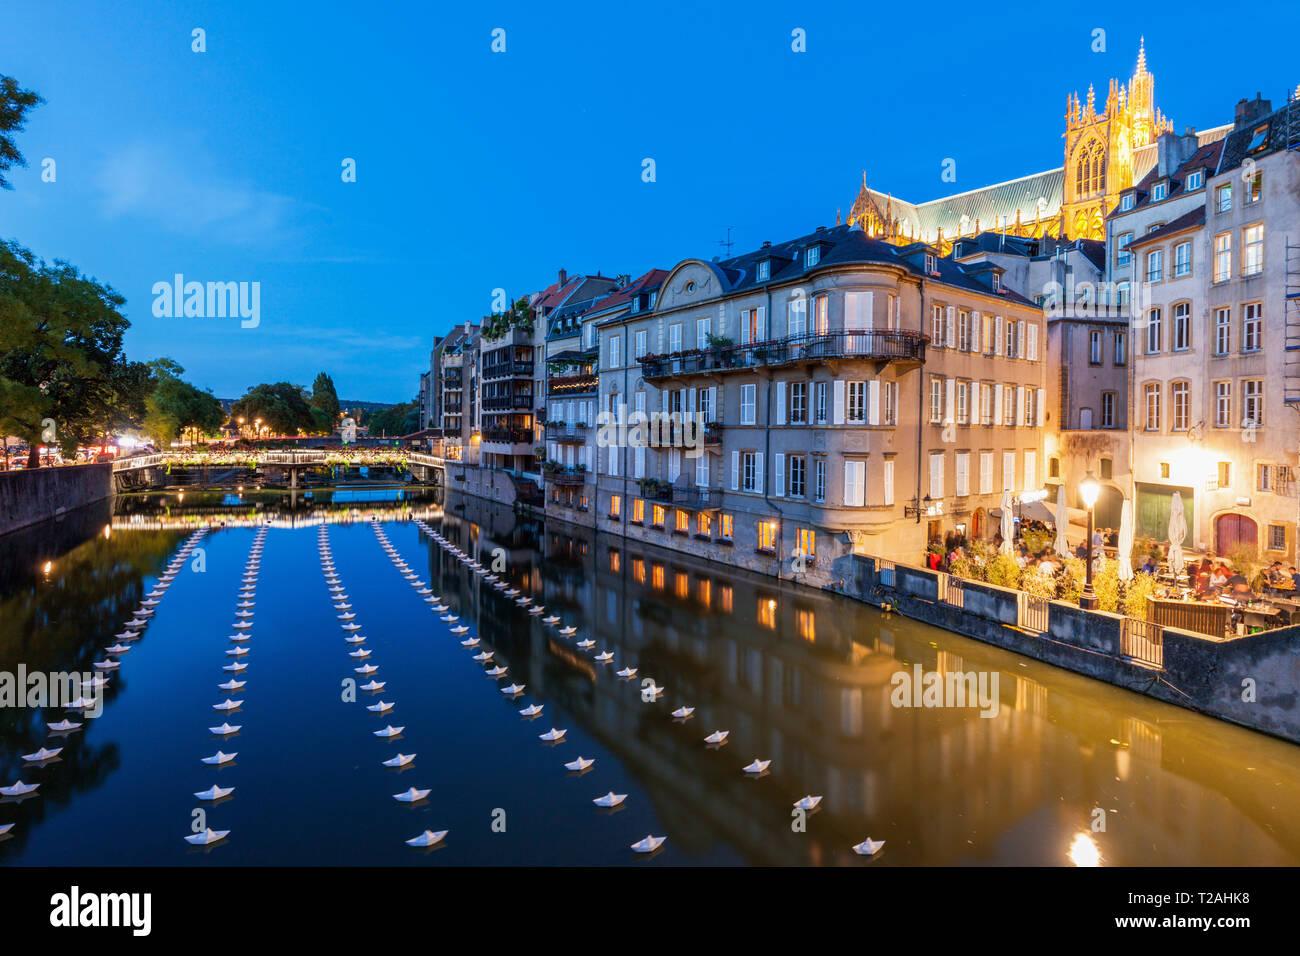 Notte a Metz, Francia Immagini Stock